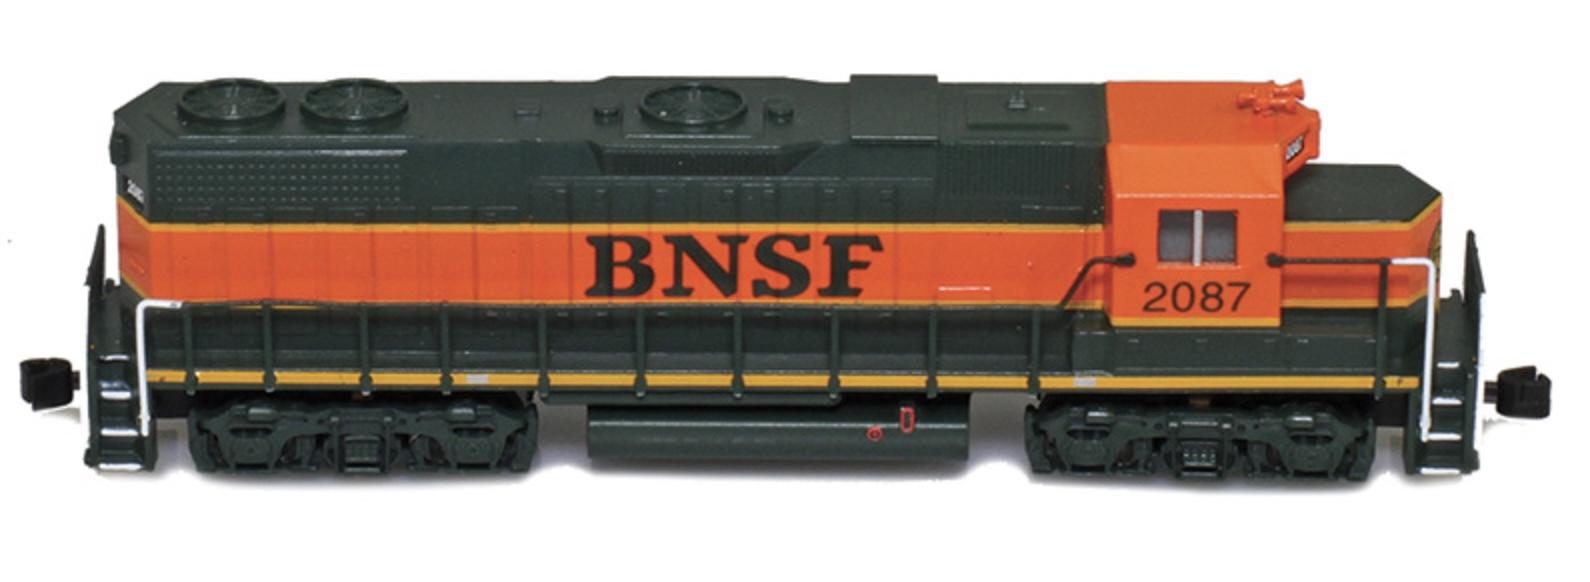 Z Scale - AZL - 62503-6 - Locomotive, Diesel, EMD GP38-2 - Burlington Northern Santa Fe - 2100